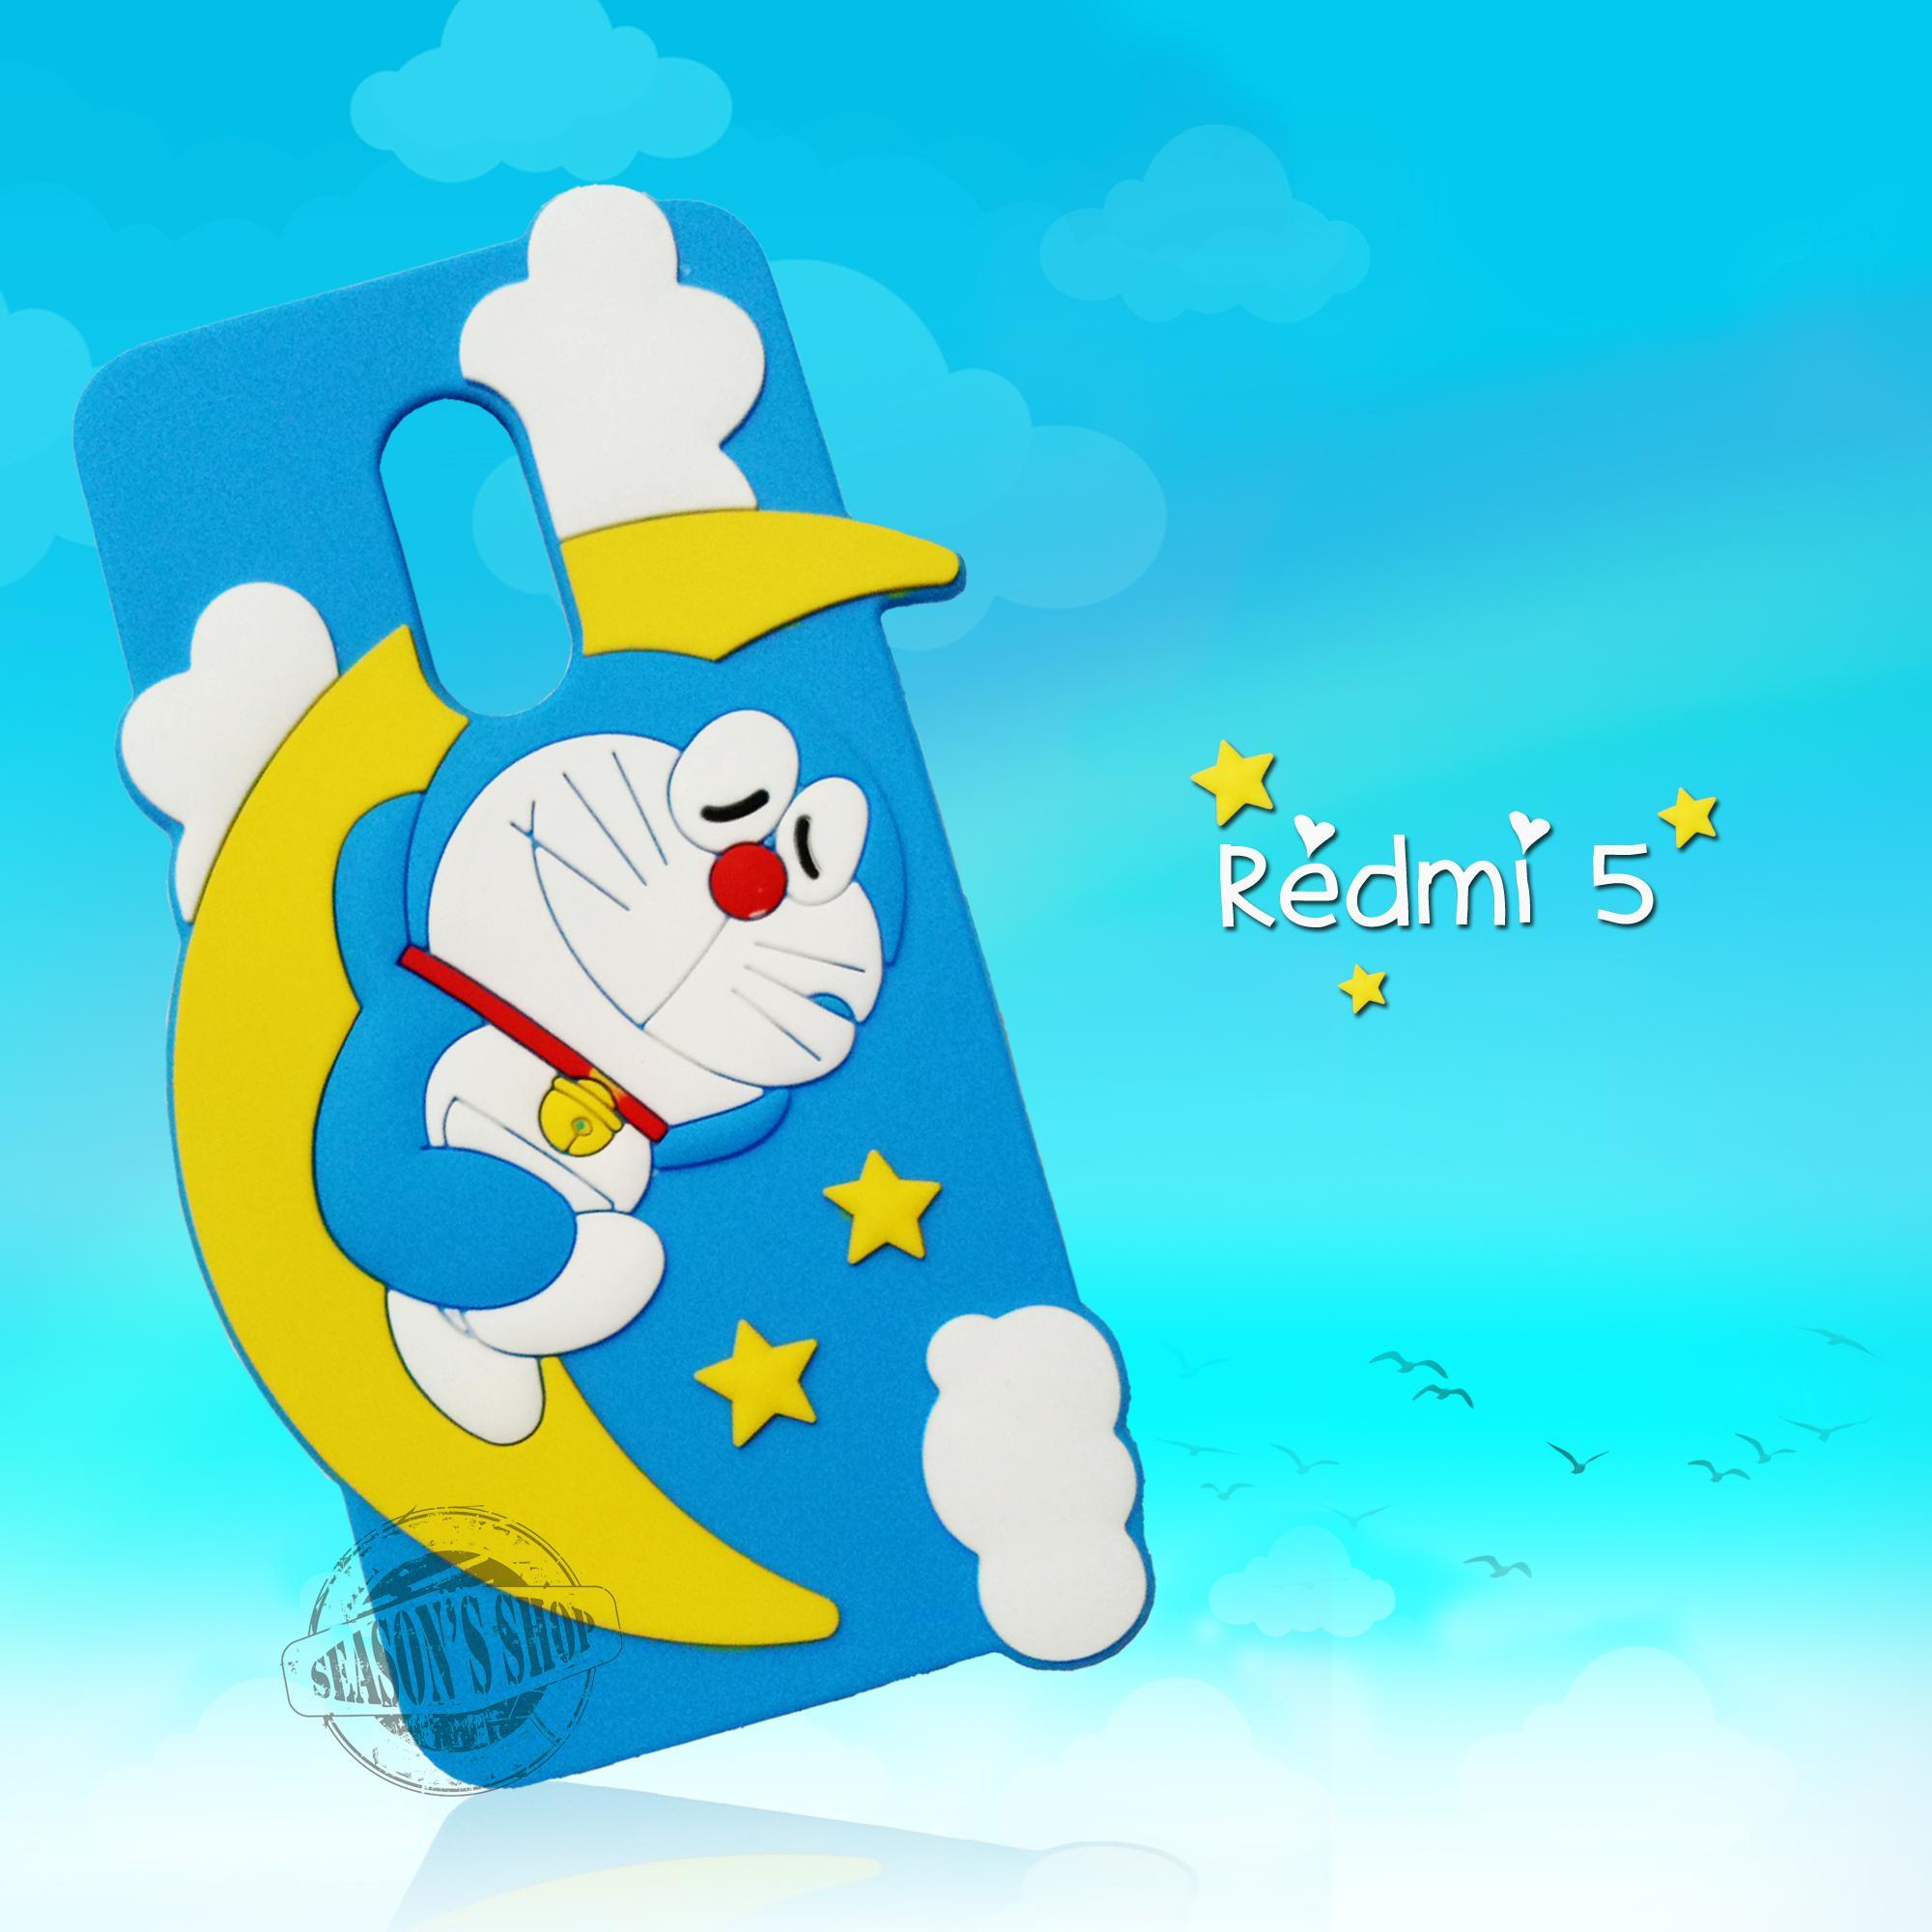 Kelebihan Joyce Softcase Cute 4d Doraemon Moon For Xiaomi Note 5a Case Polkadot Redmi 5x 5plus Seasons 5